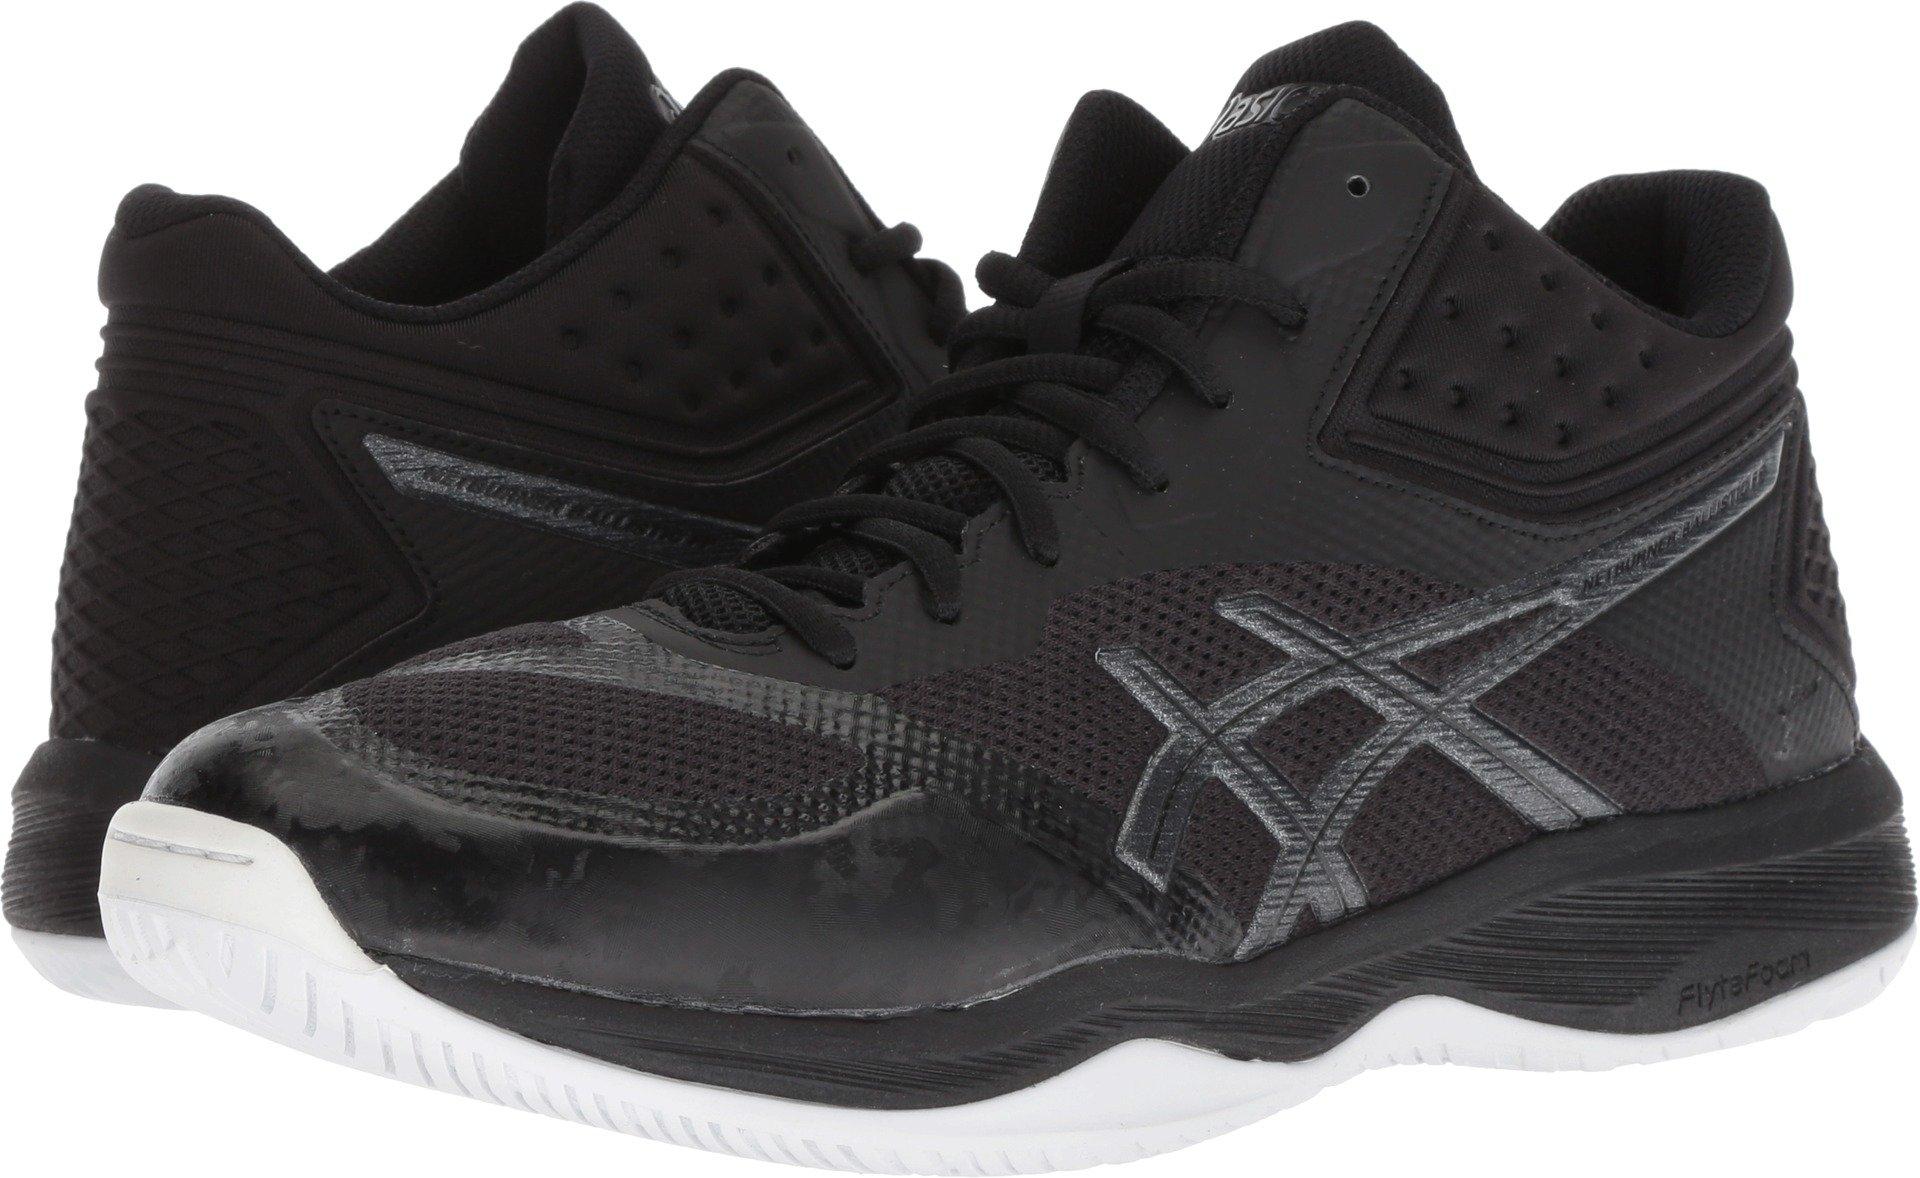 ASICS Men's Netburner Ballistic FF MT Volleyball Shoes, Black/Black, Size 6